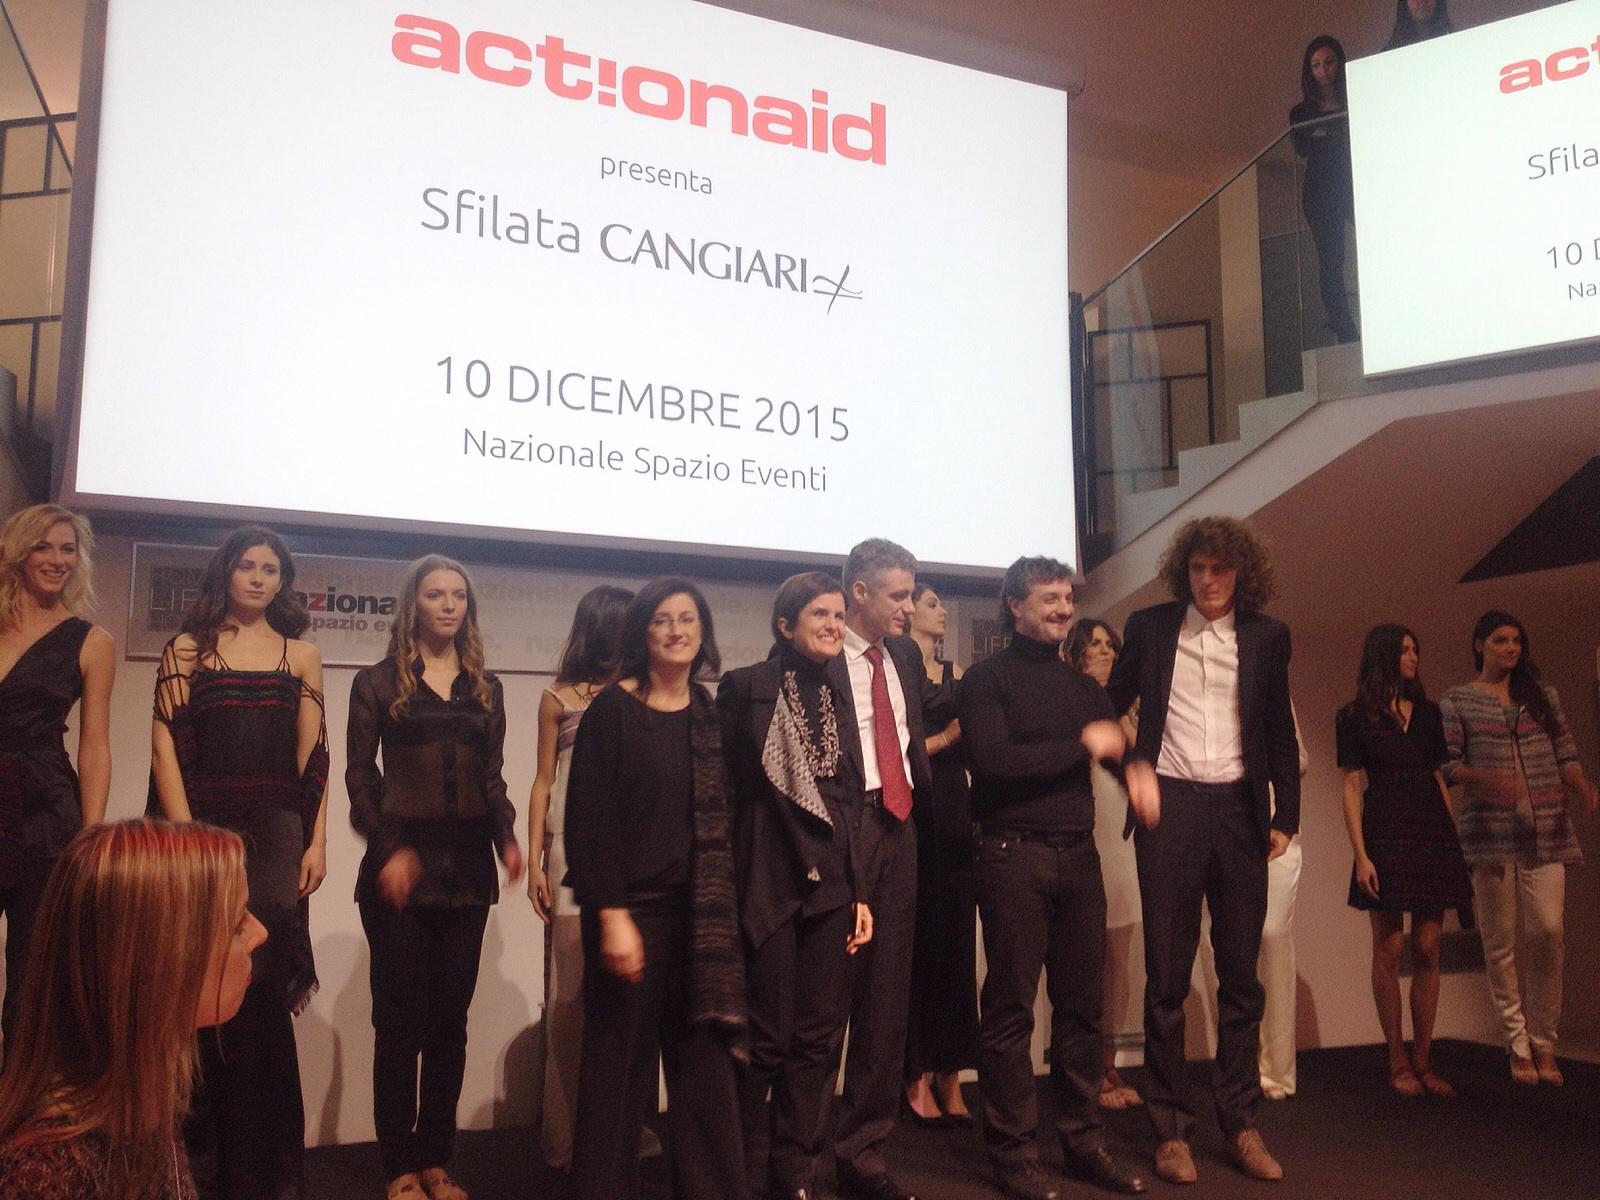 Cangiari's fashion show